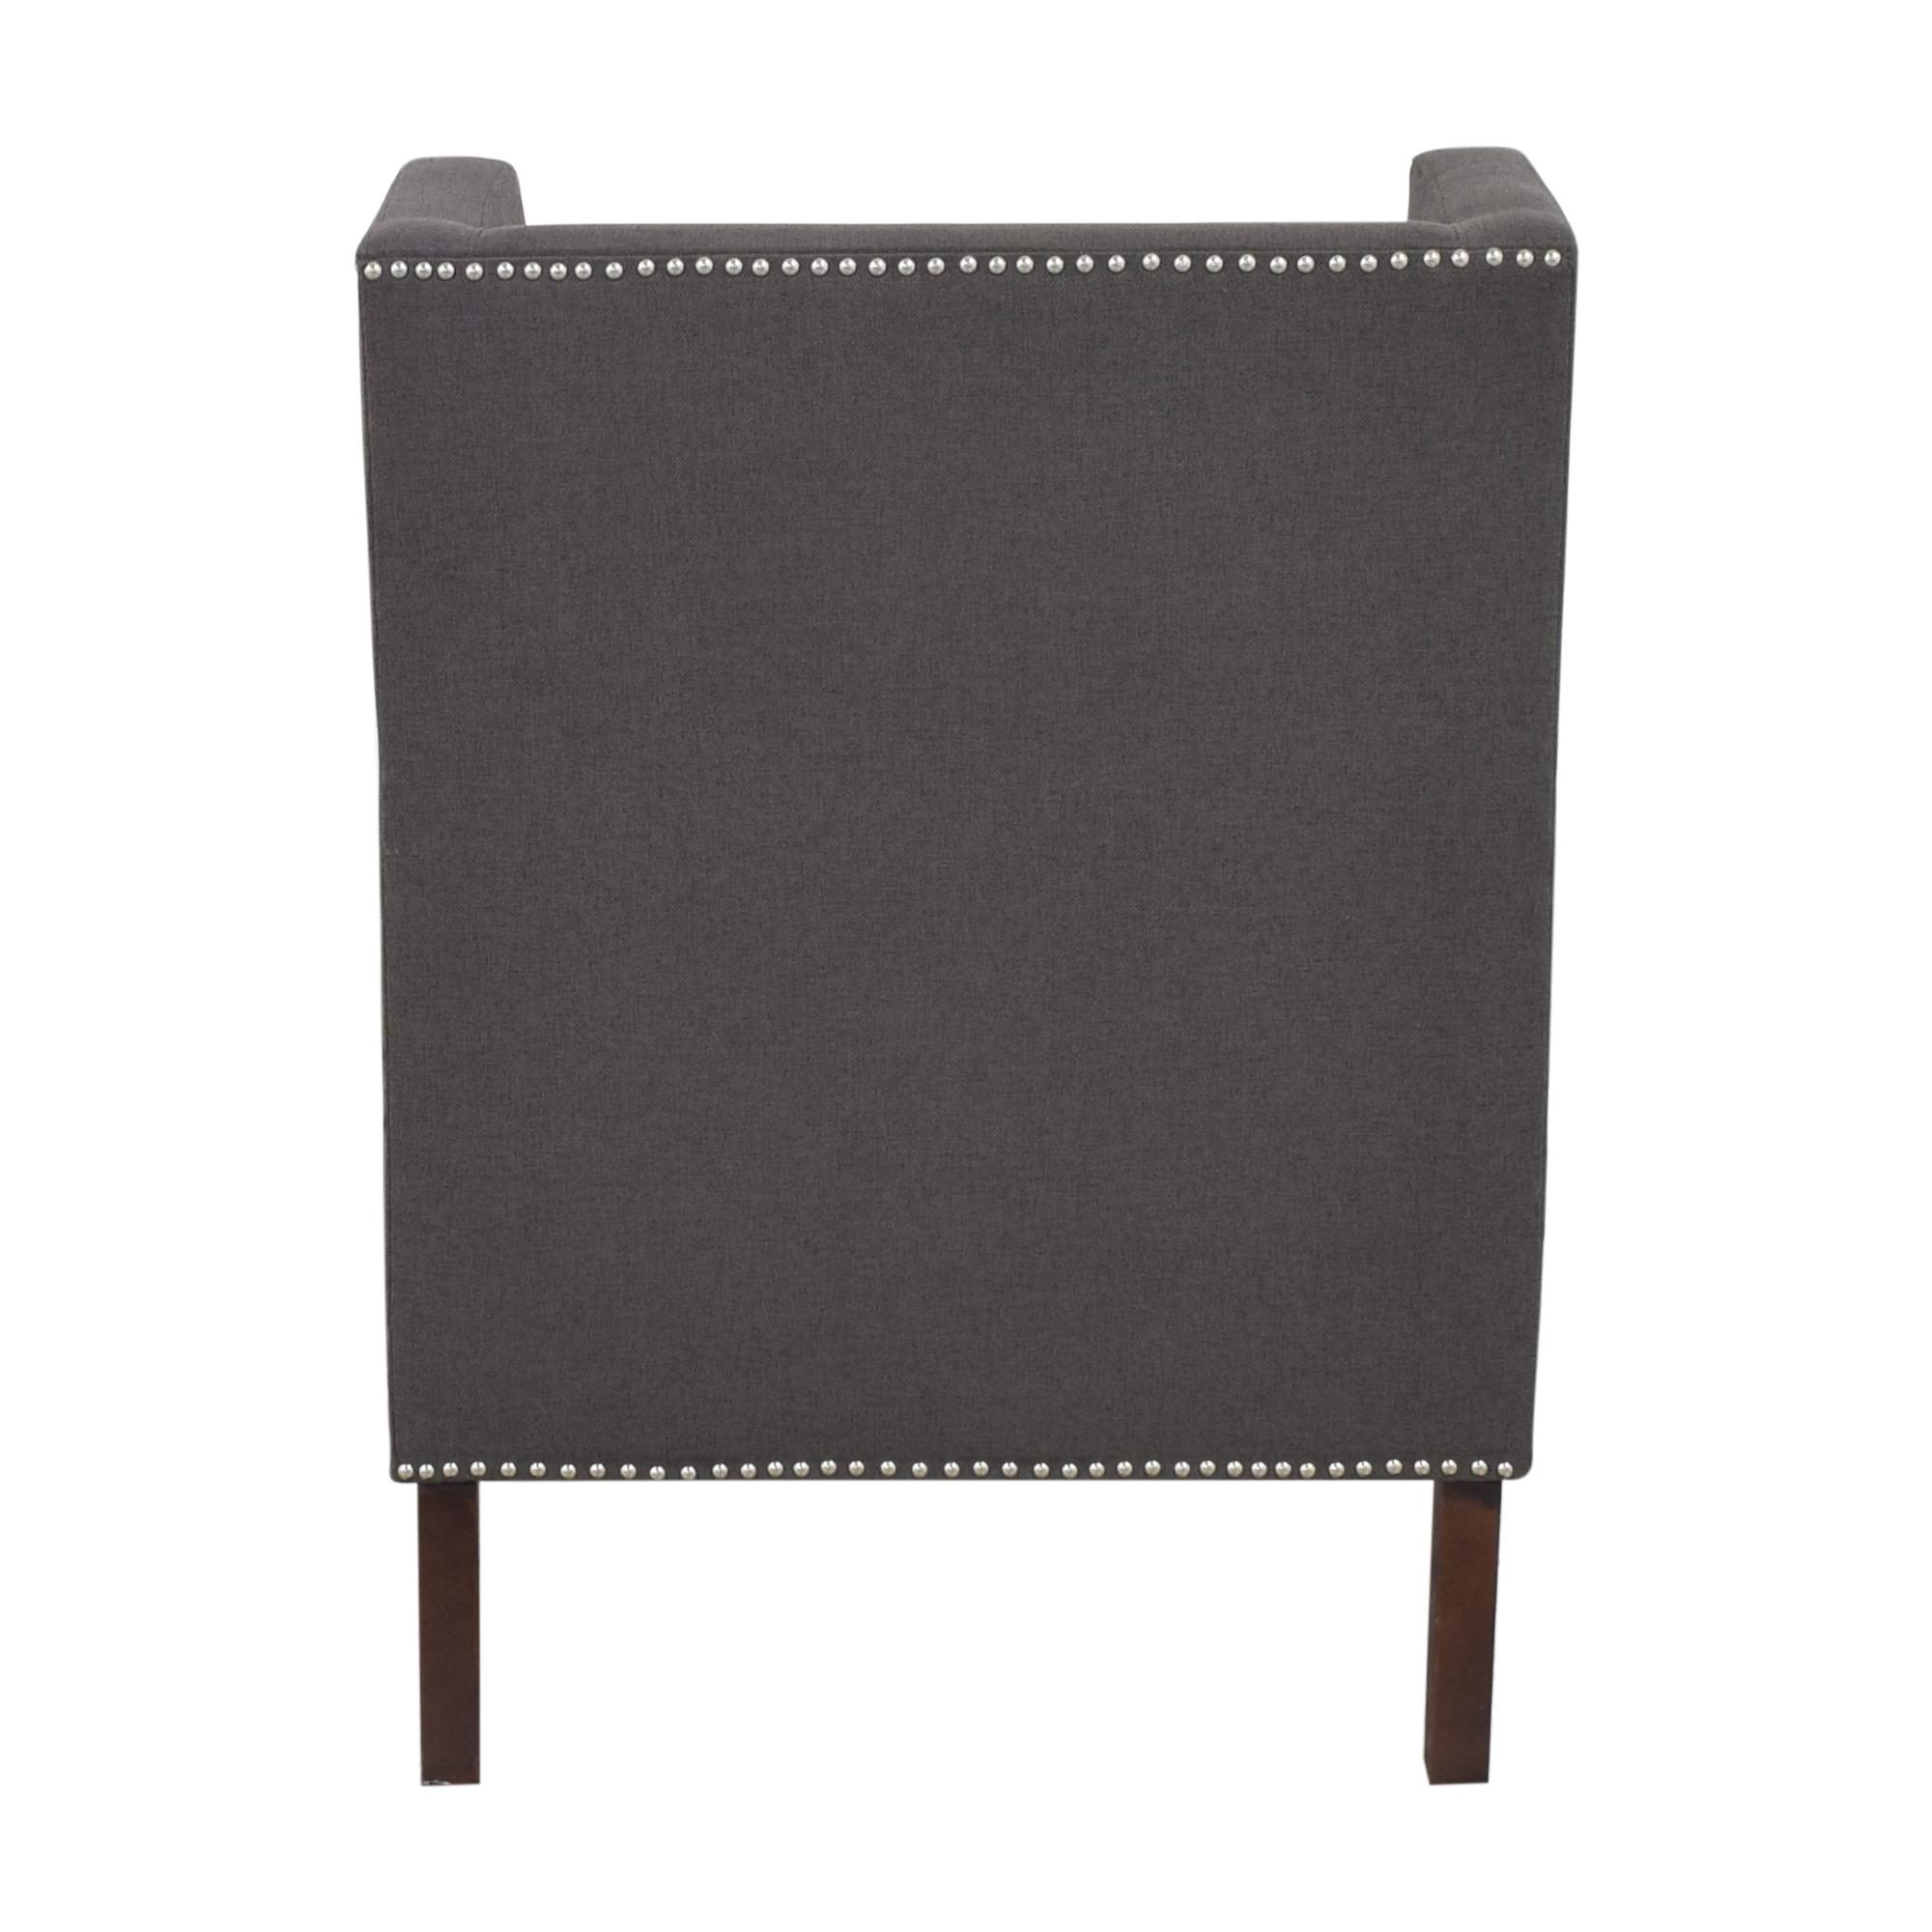 E&E Co. Wingback Arm Chair E&E Co